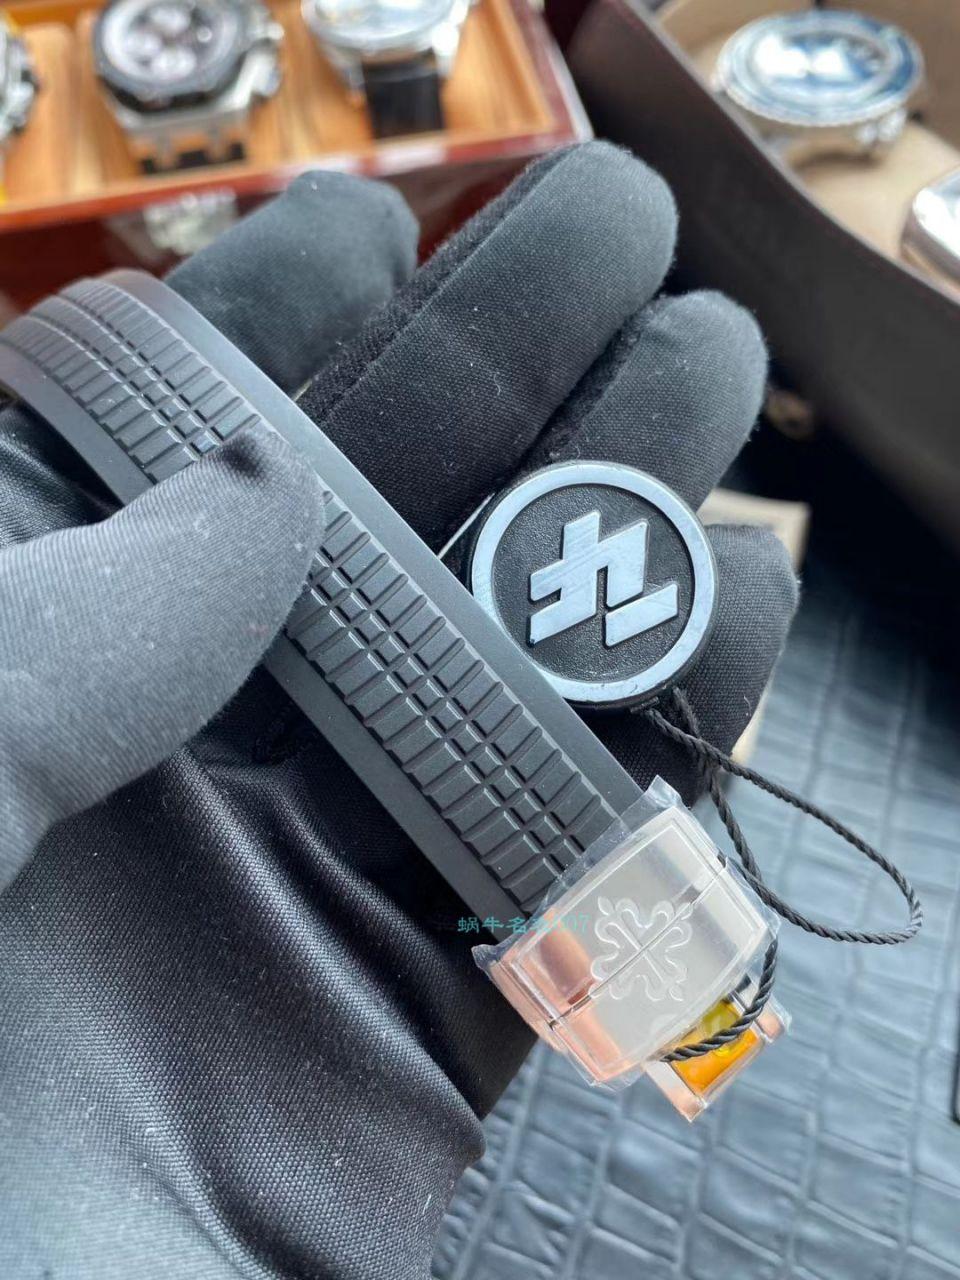 ZF厂官网复刻手表百达翡丽手雷5167A-001腕表